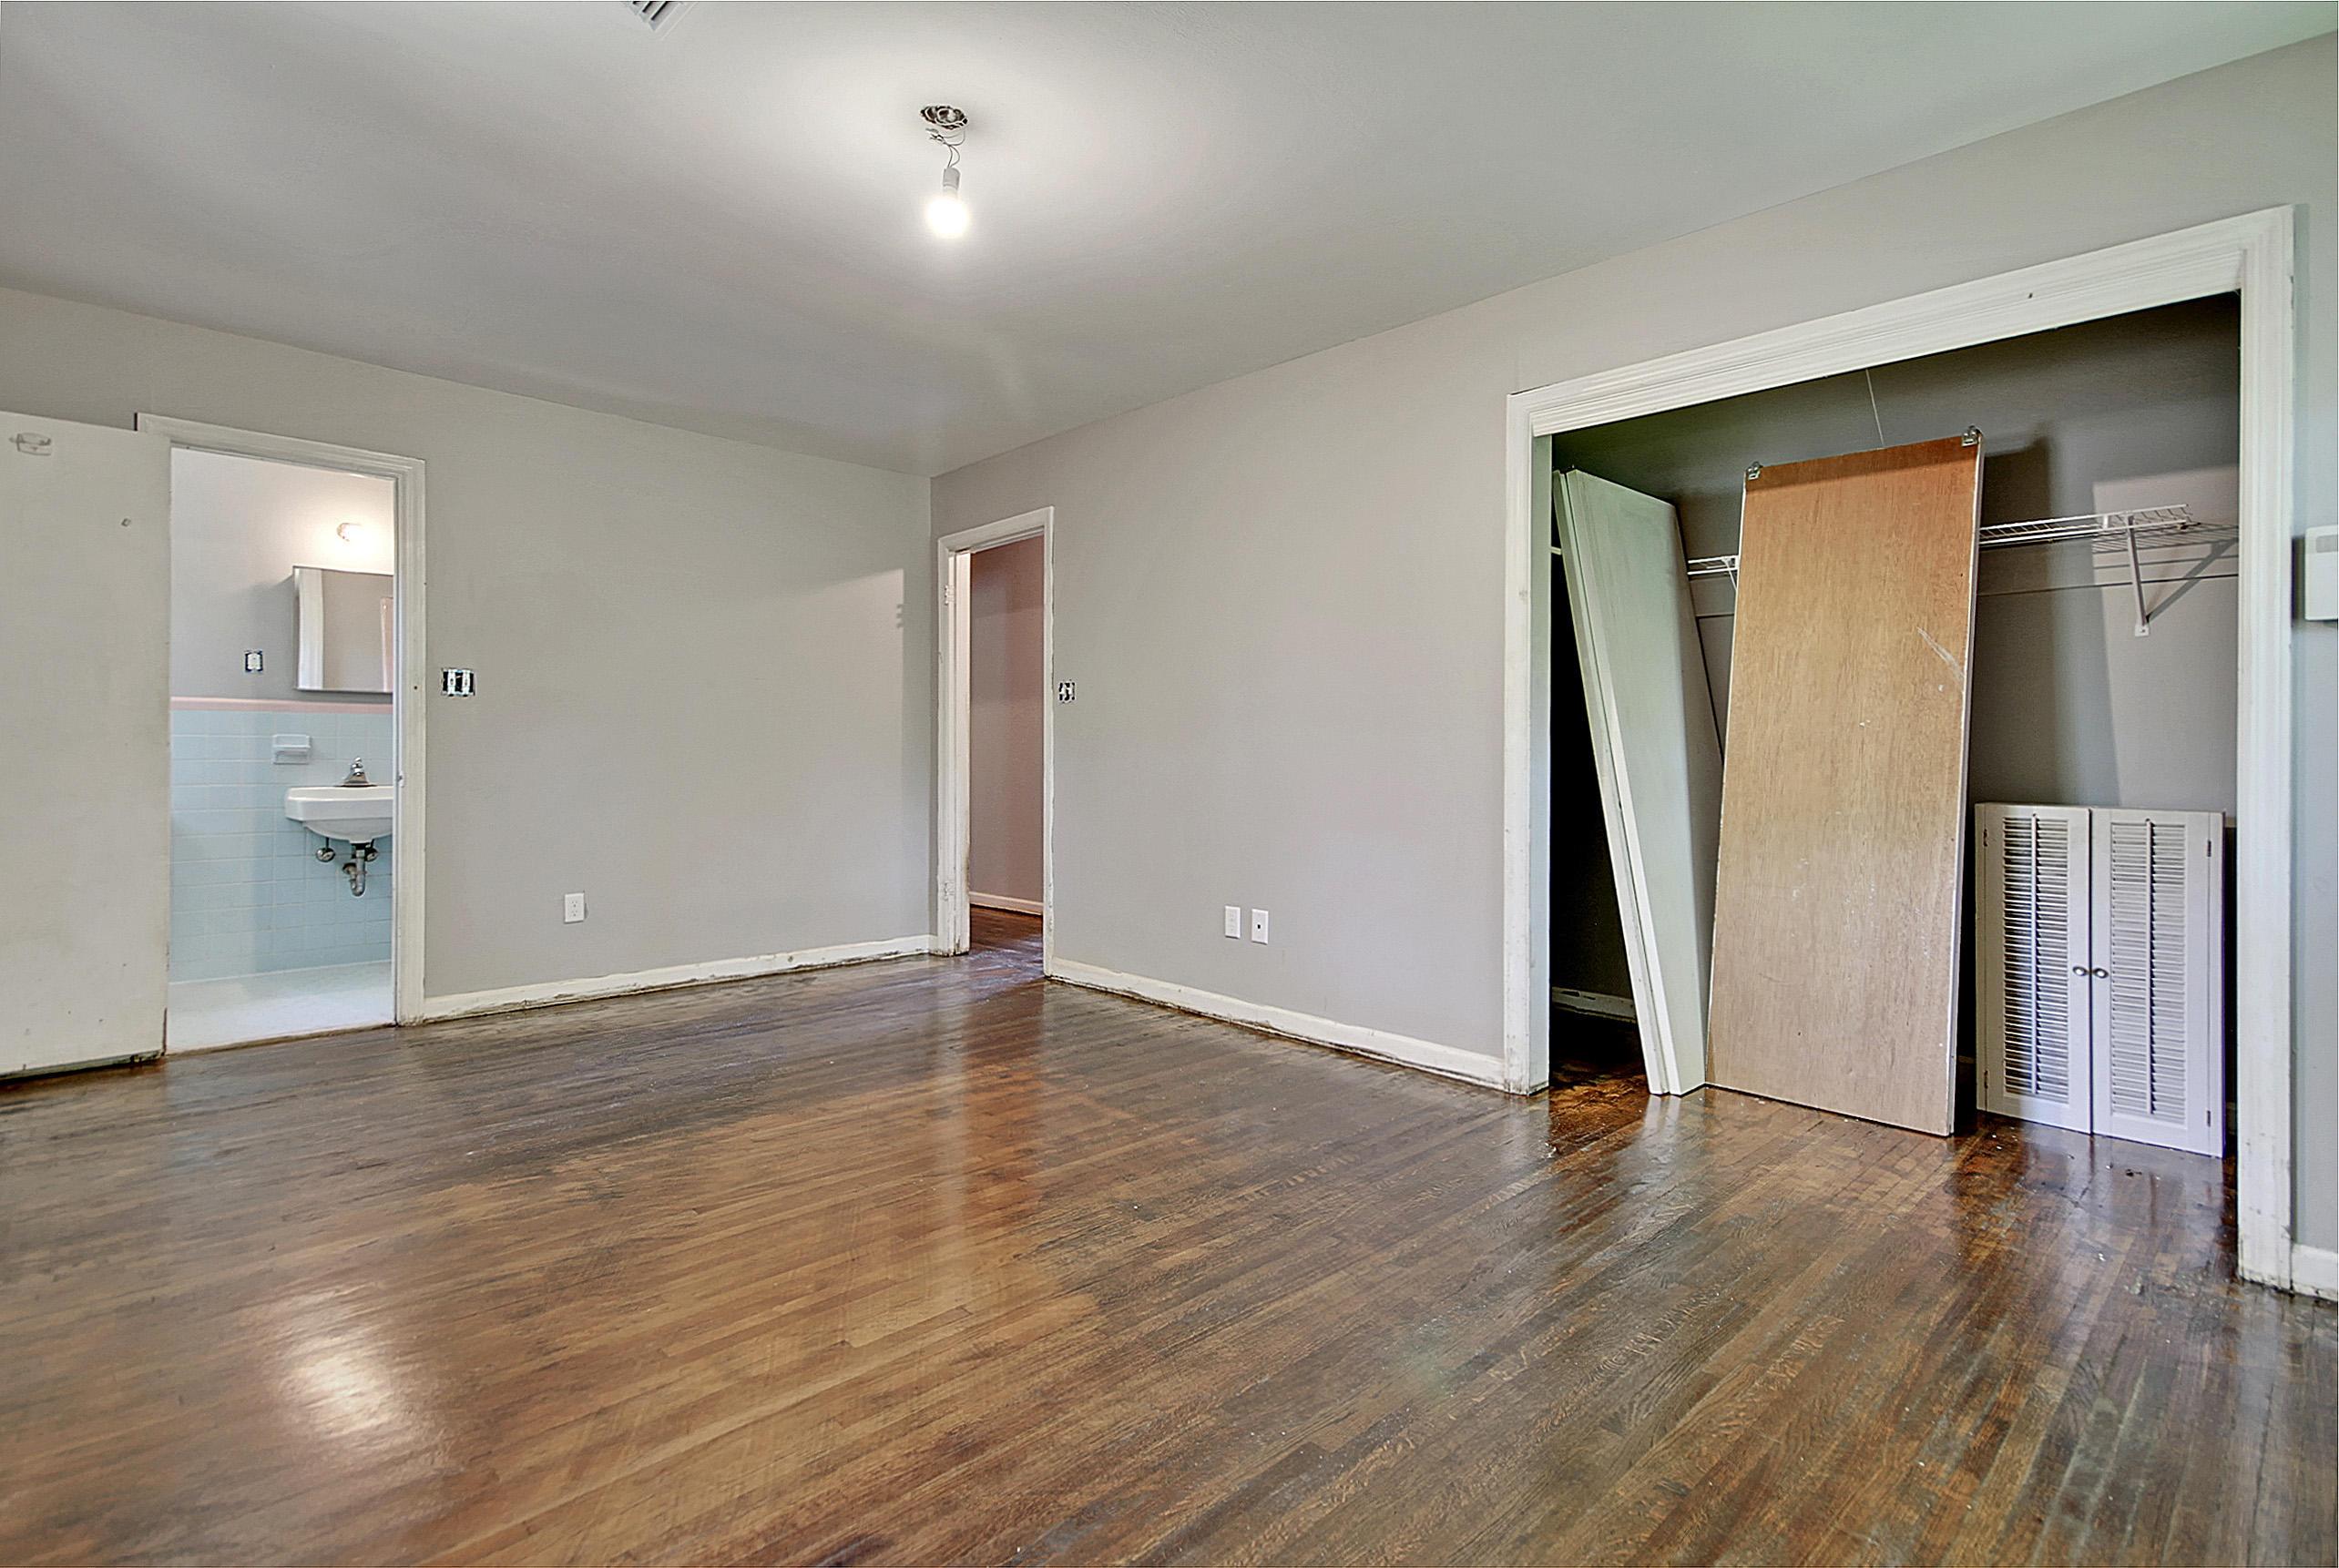 Northbridge Terrace Homes For Sale - 1094 Northbridge, Charleston, SC - 3